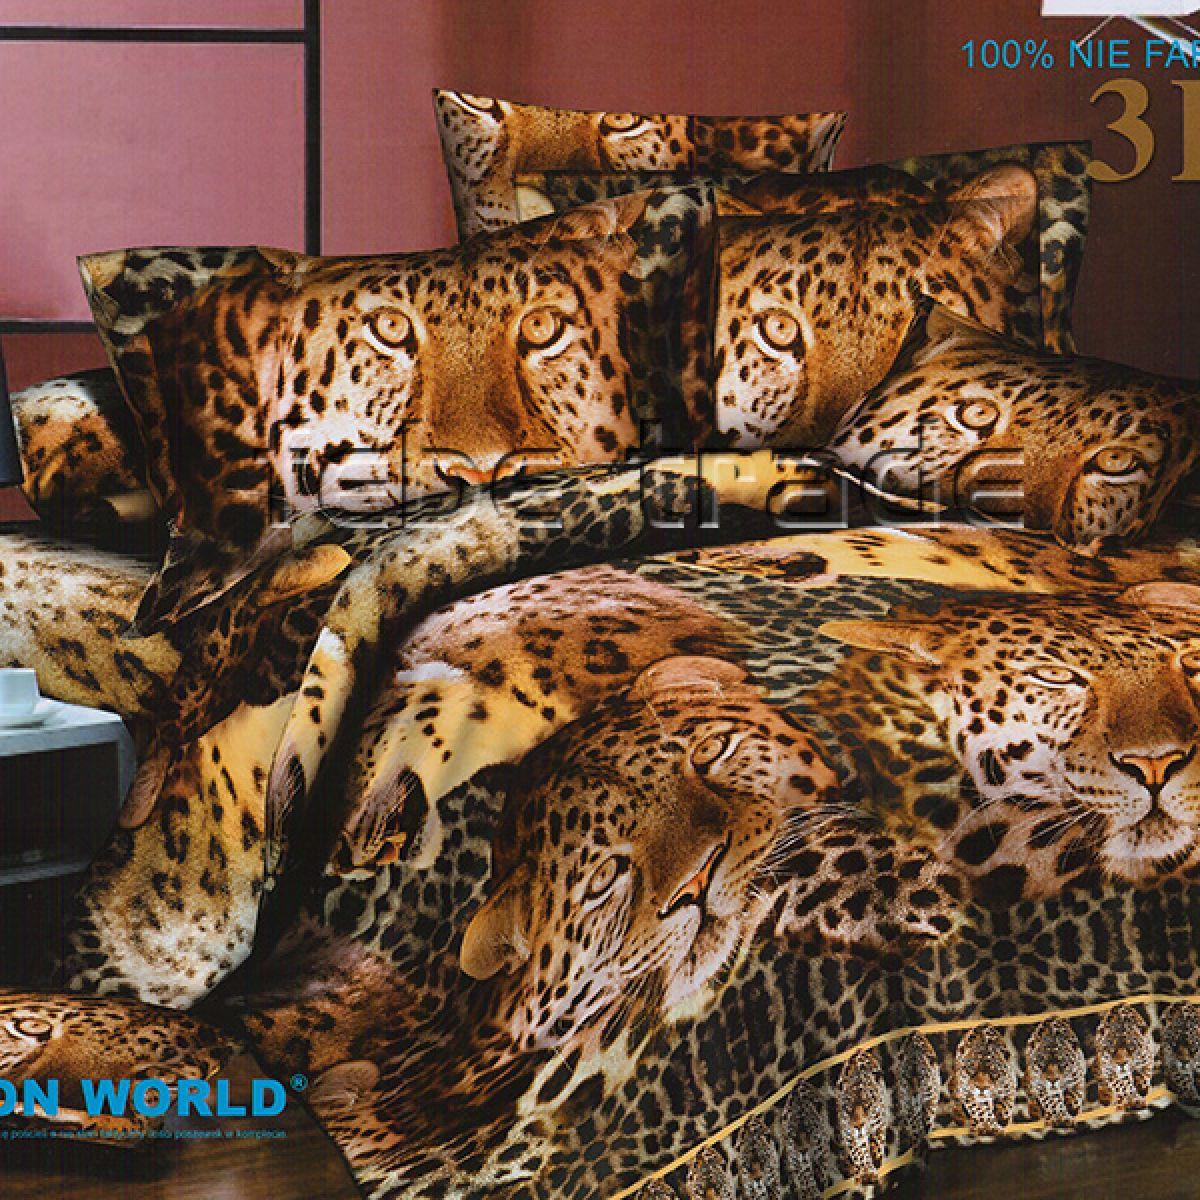 3D Beddings - Cotton World - FSB-234 - 220x200 cm - 4 pcs